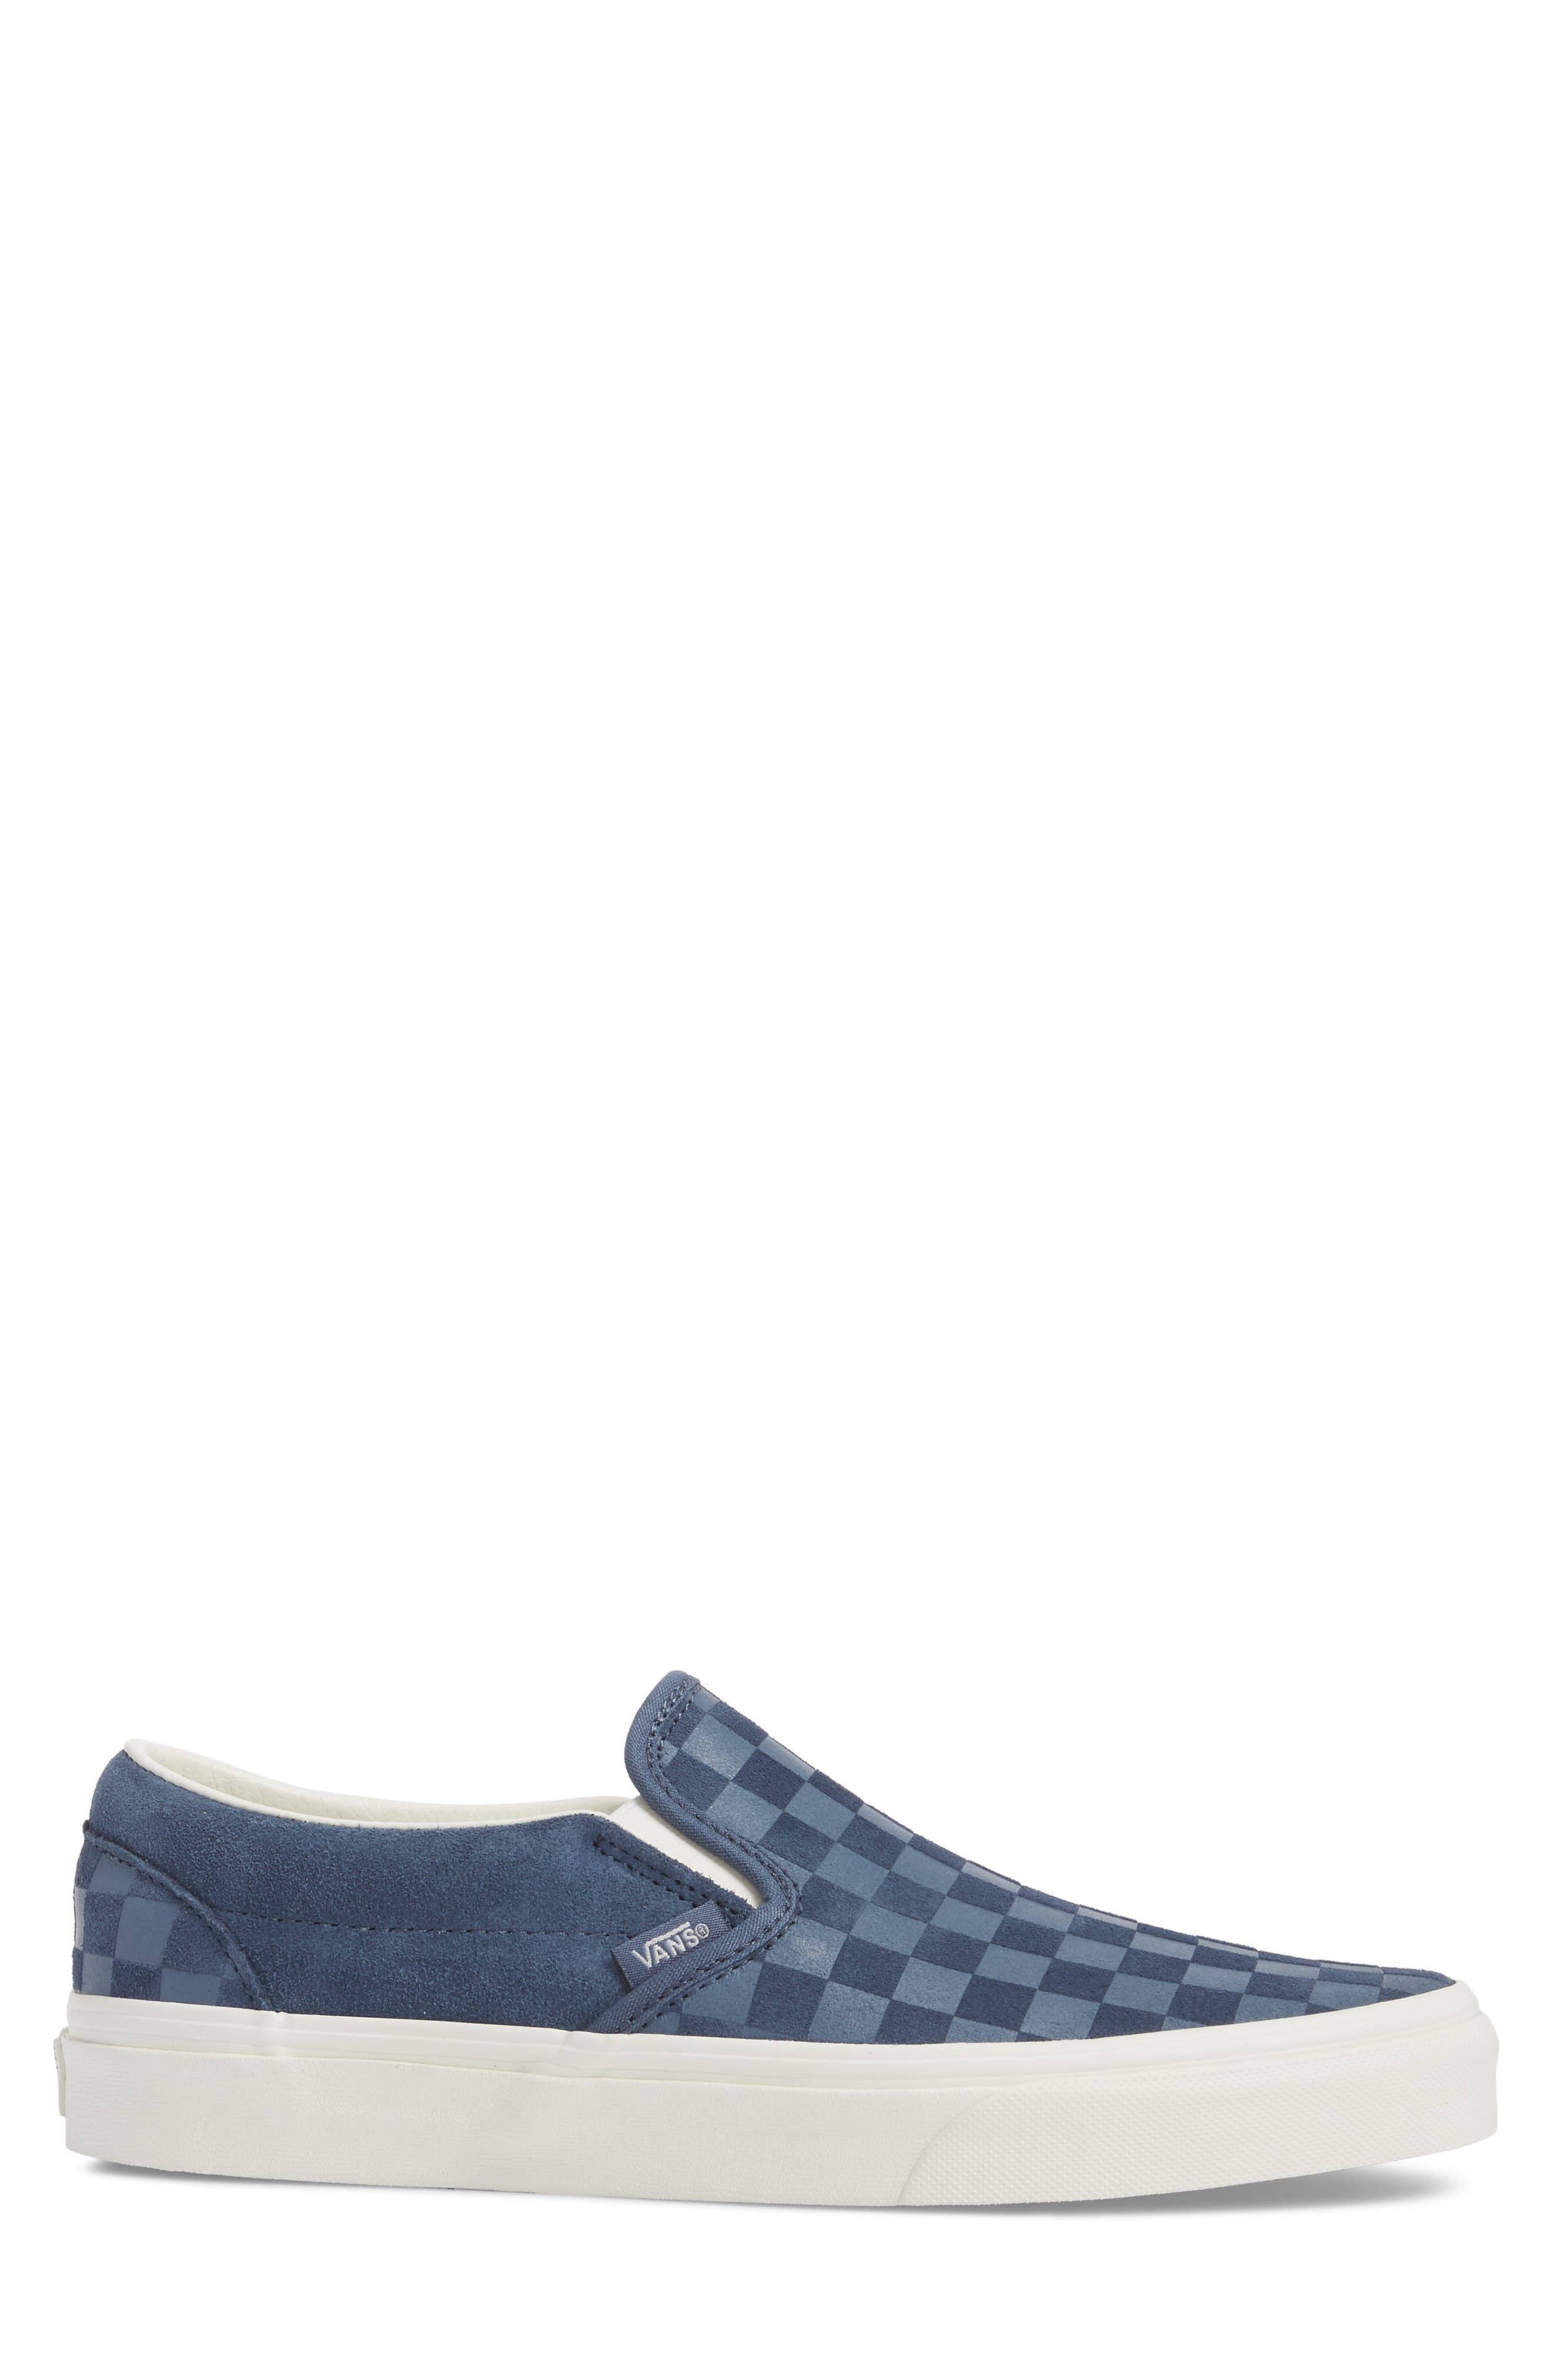 Classic Slip-On Sneaker,                             Alternate thumbnail 3, color,                             Indigo/ Marshmallow Leather